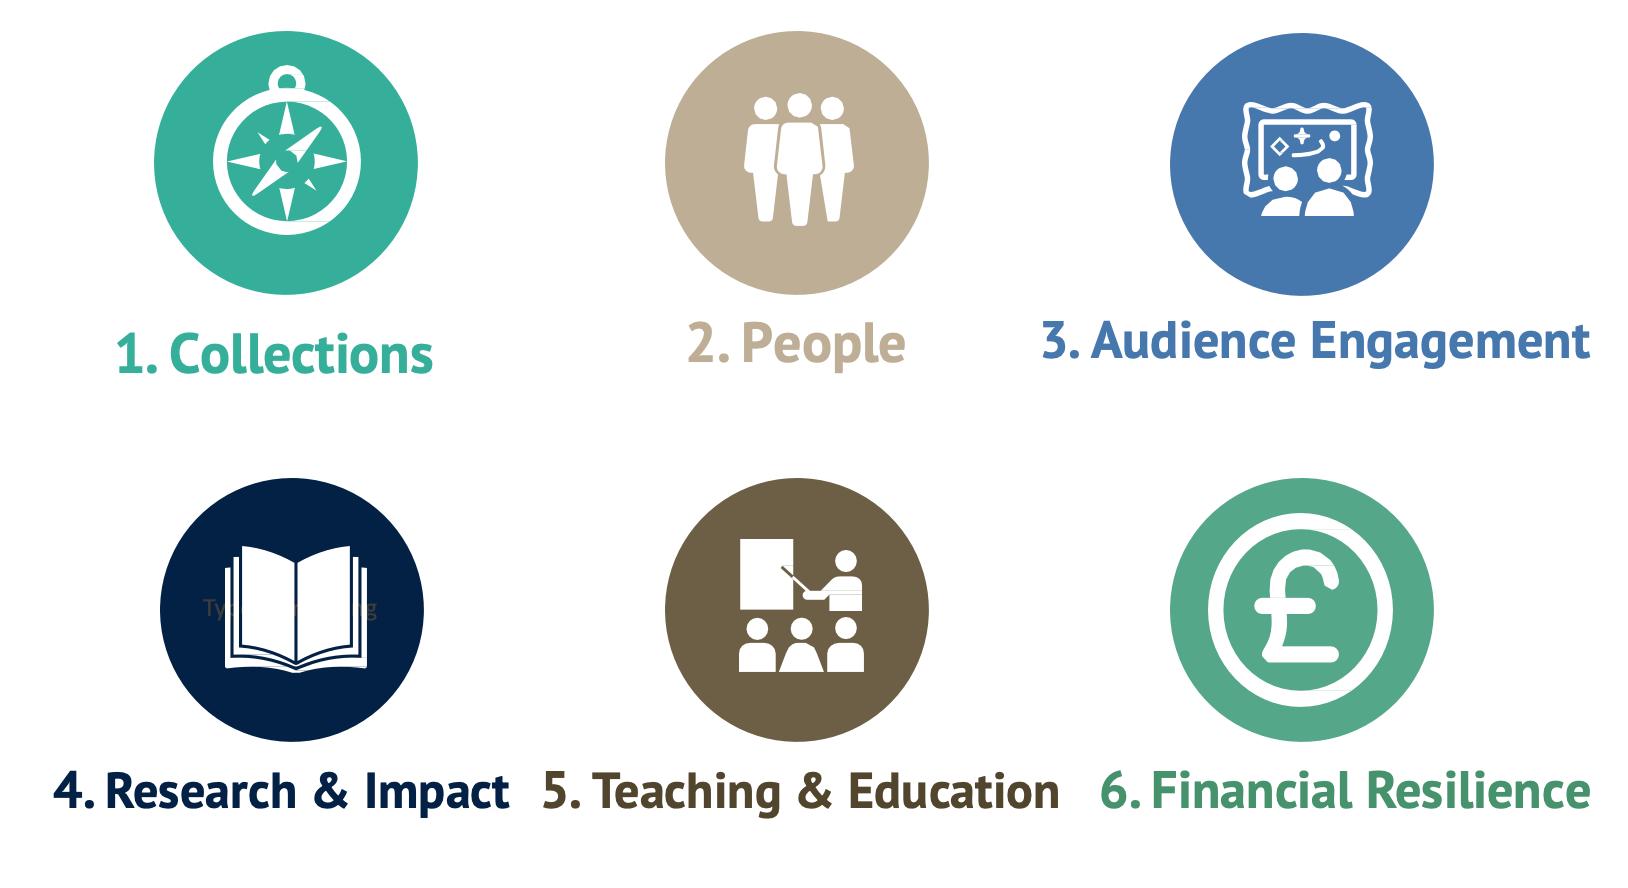 6 Strategic Priorities - icons